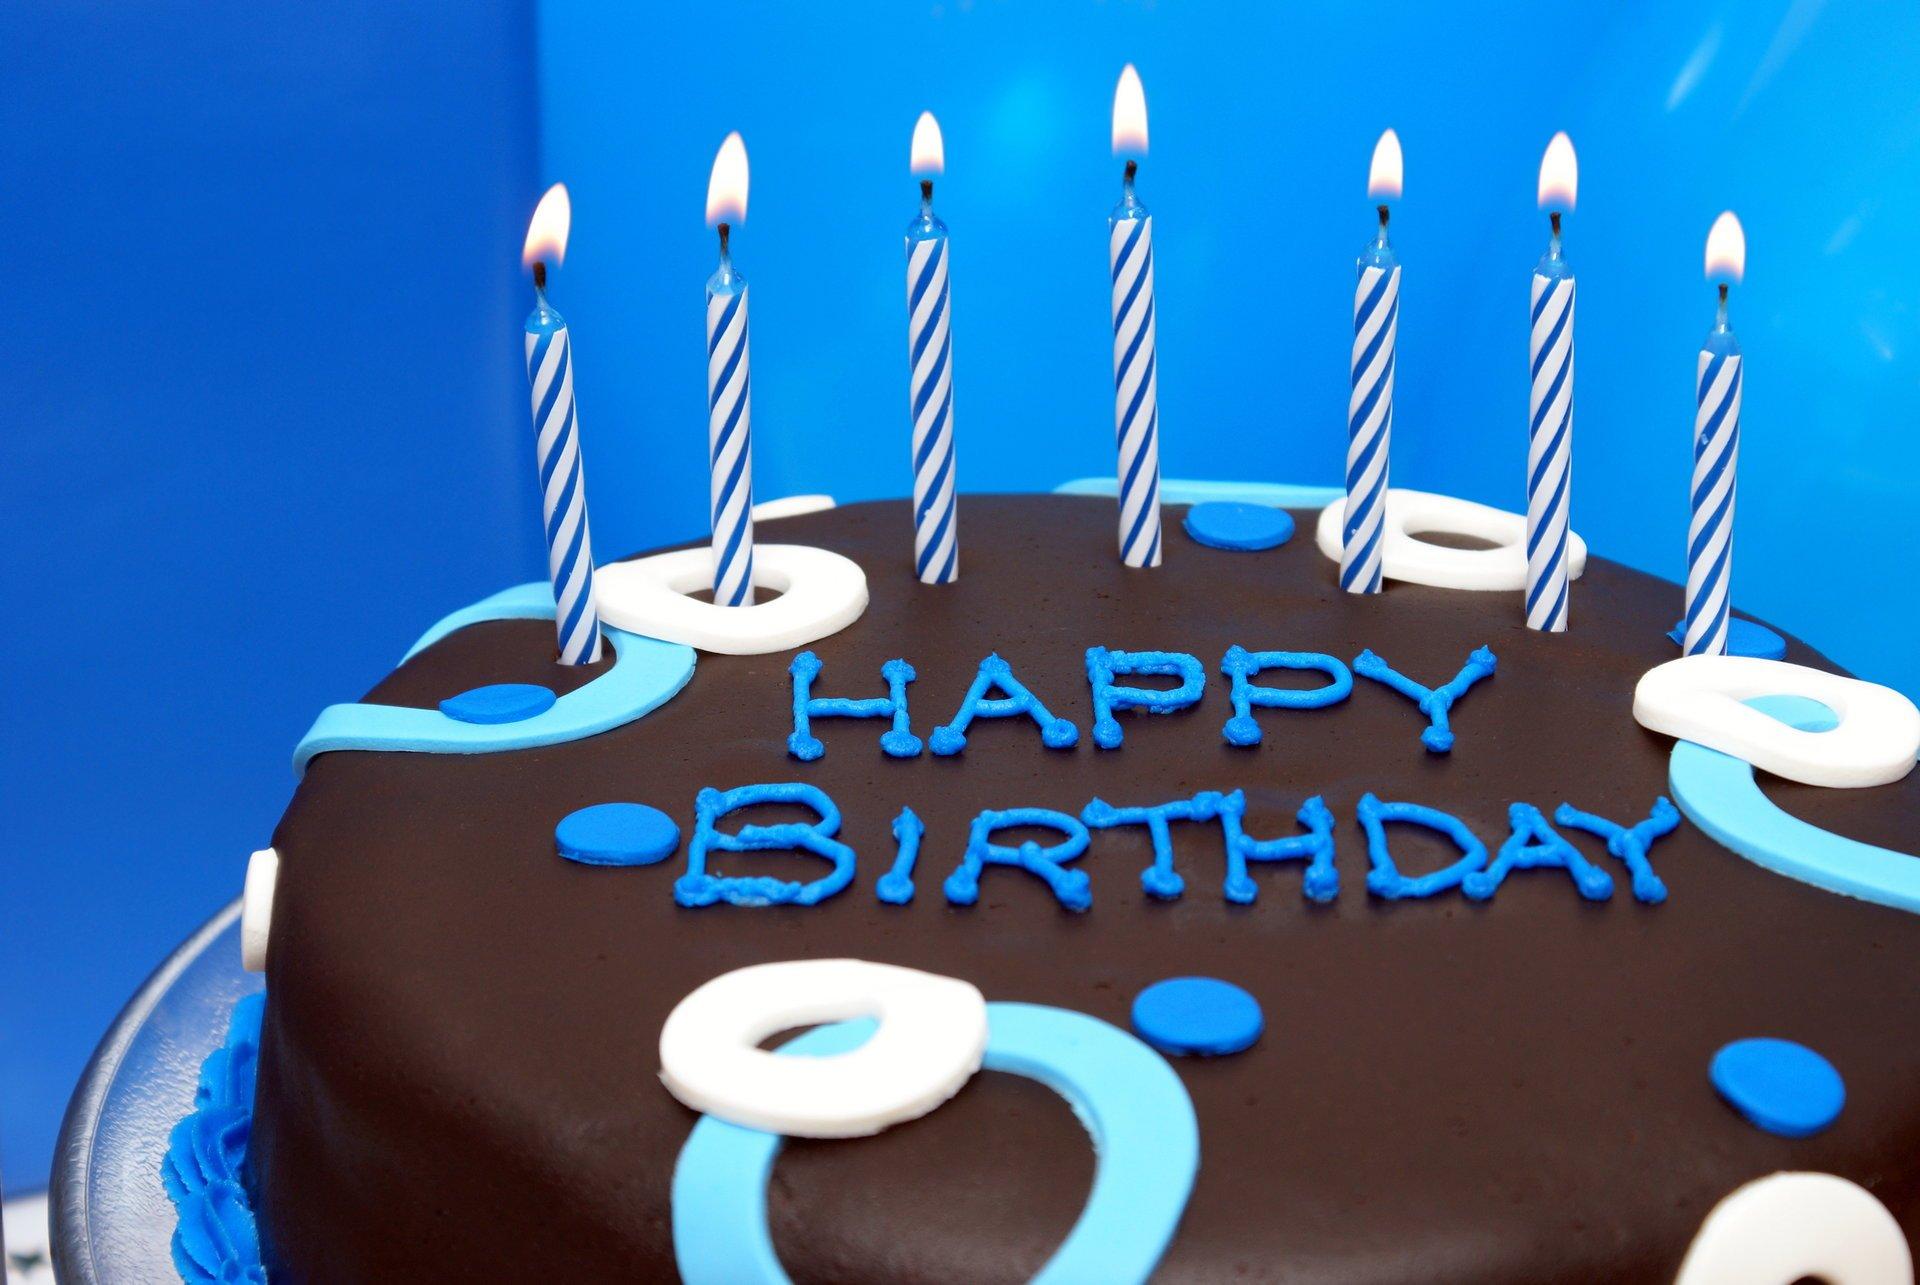 хотите открытки с днем рождения синие кухонного окна шторами